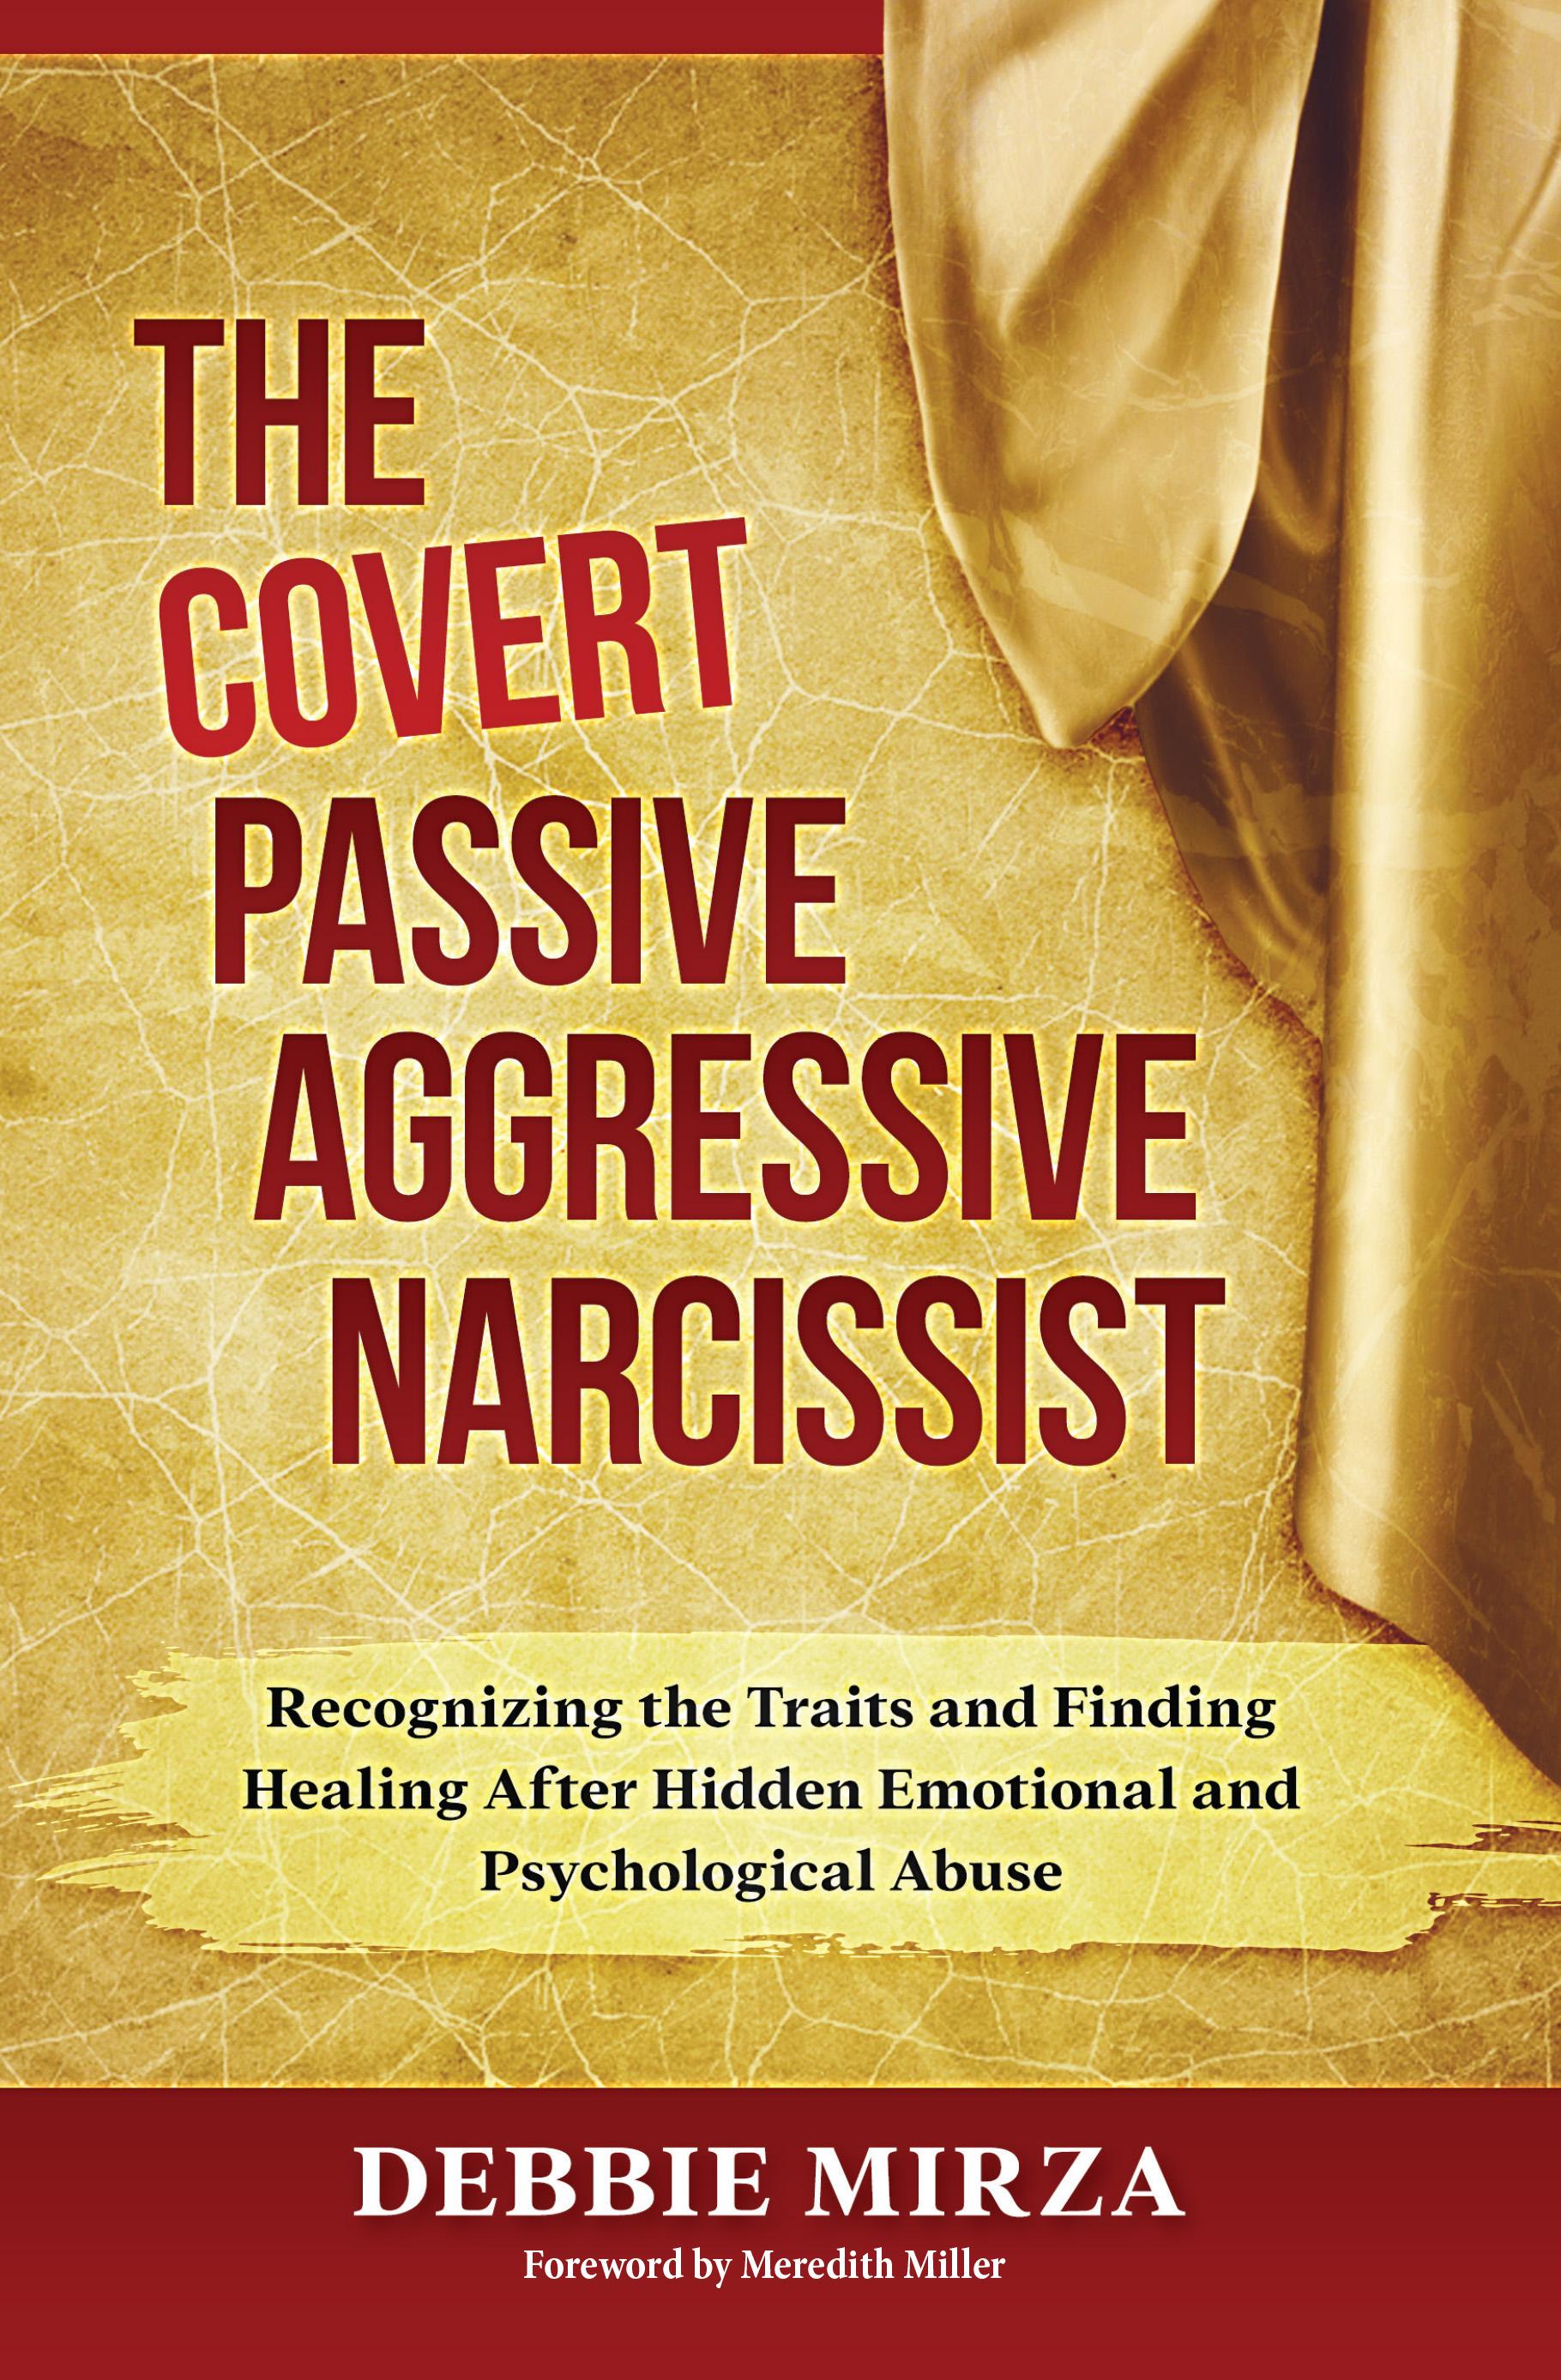 The Covert Passive Agressive Narcissist_cover-ebook.jpg